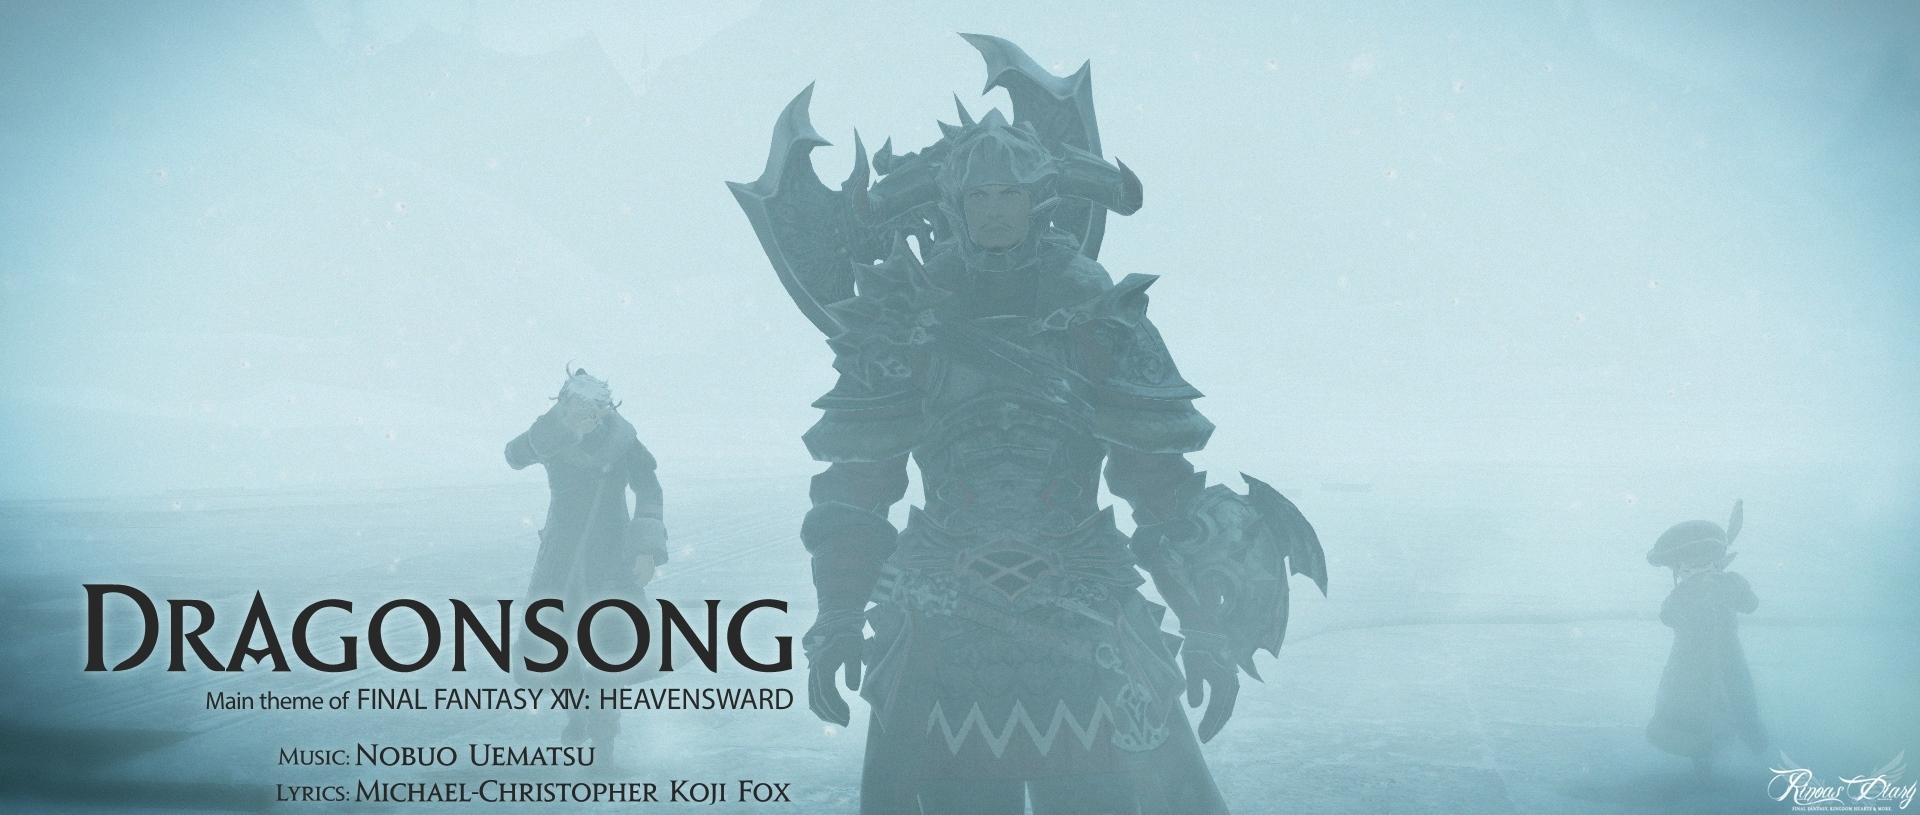 ffxiv_dragonsong_001